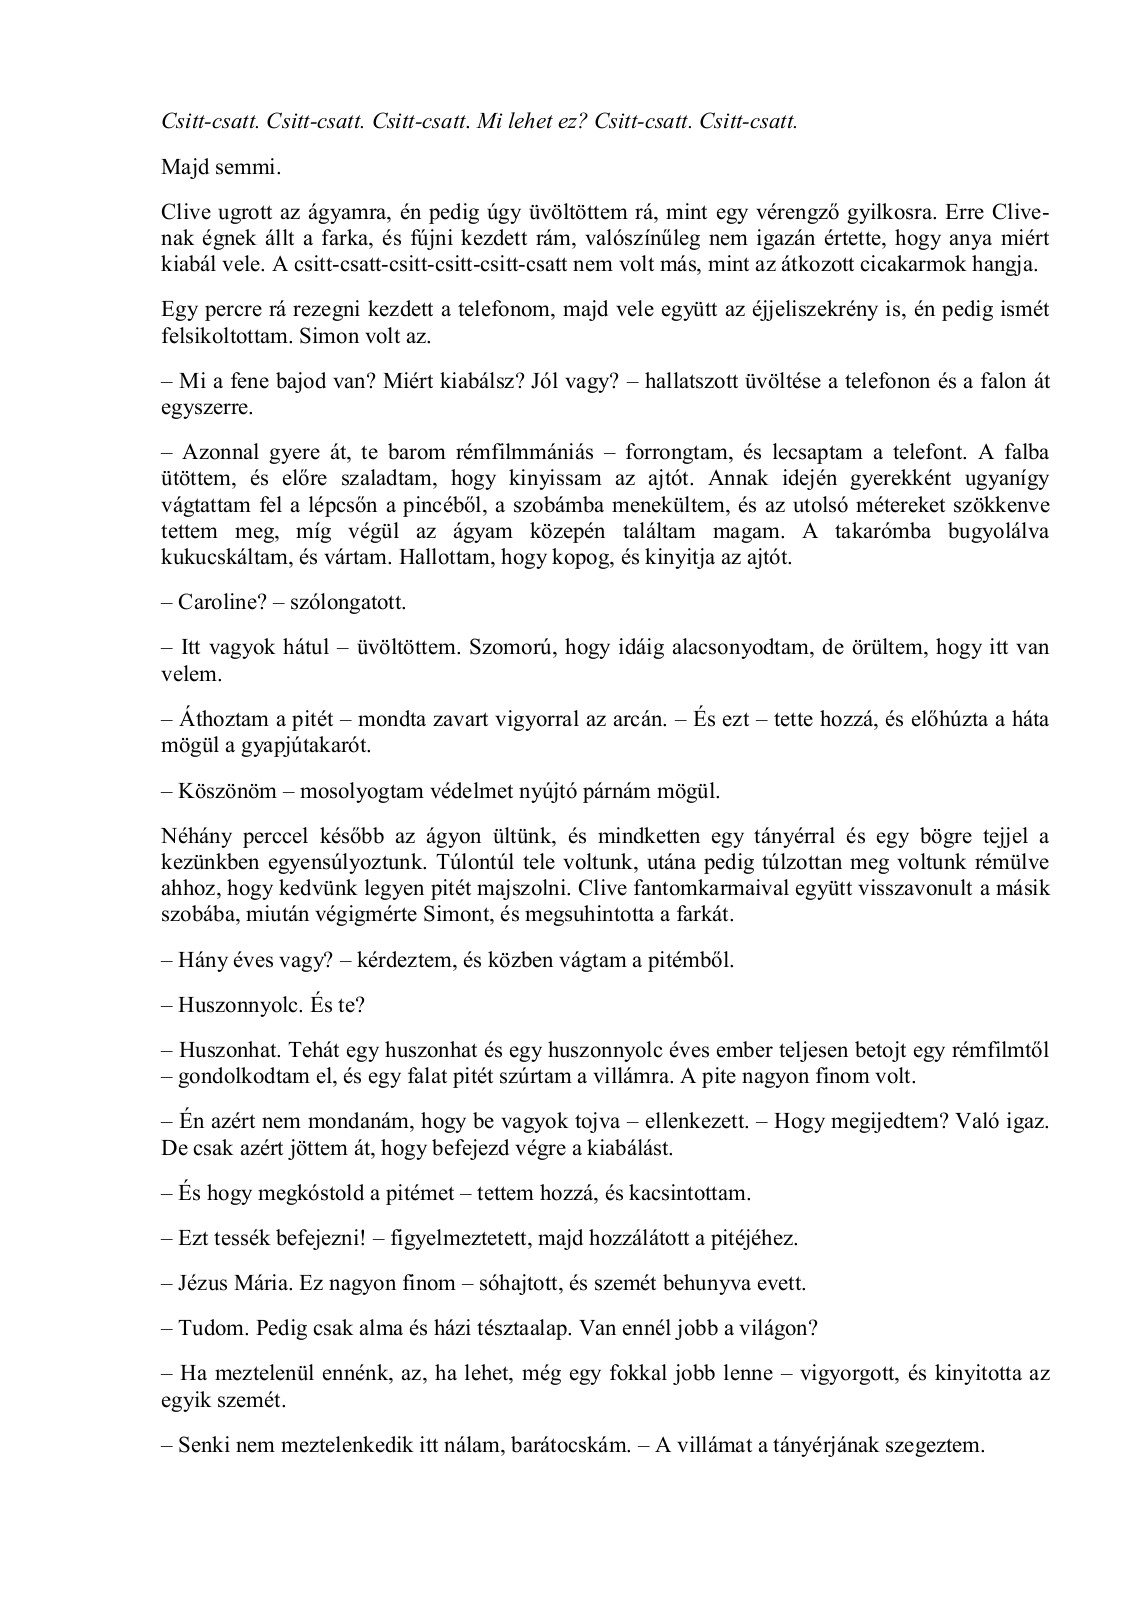 Selfbondage - História grátis BDSM no kovacsoltvas-kerites-korlat.hu